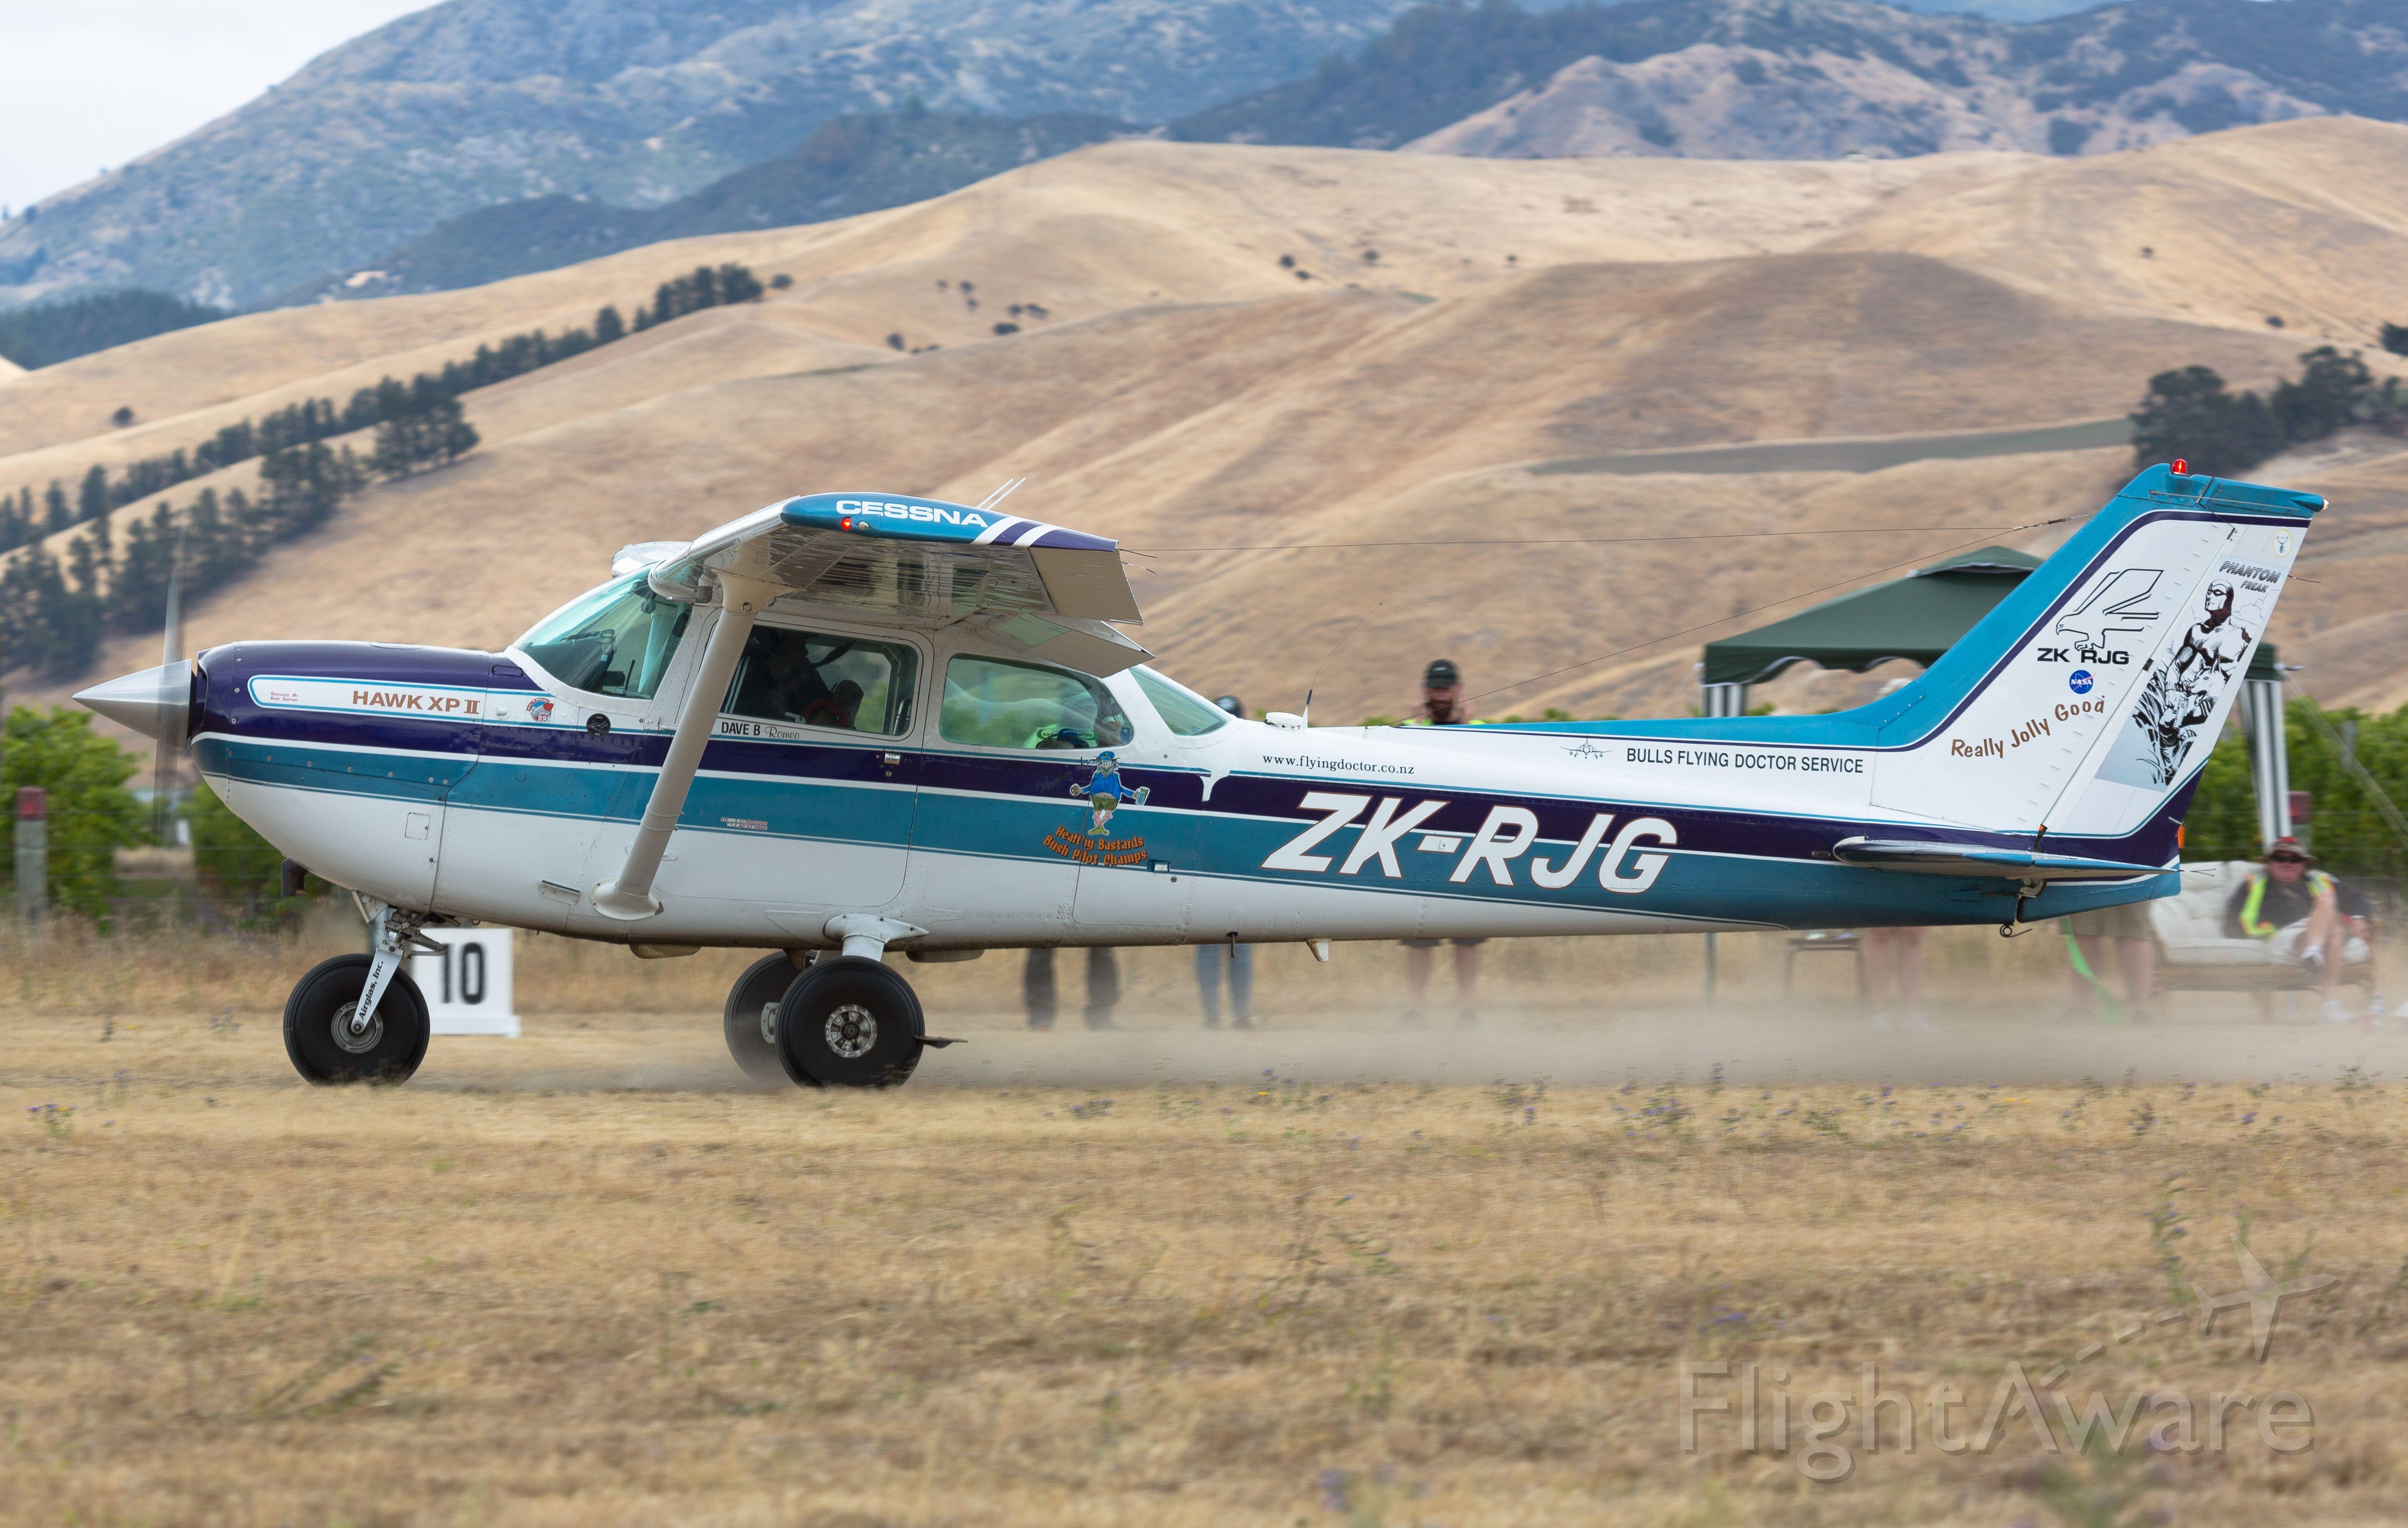 Cessna Skyhawk (ZK-RJG)